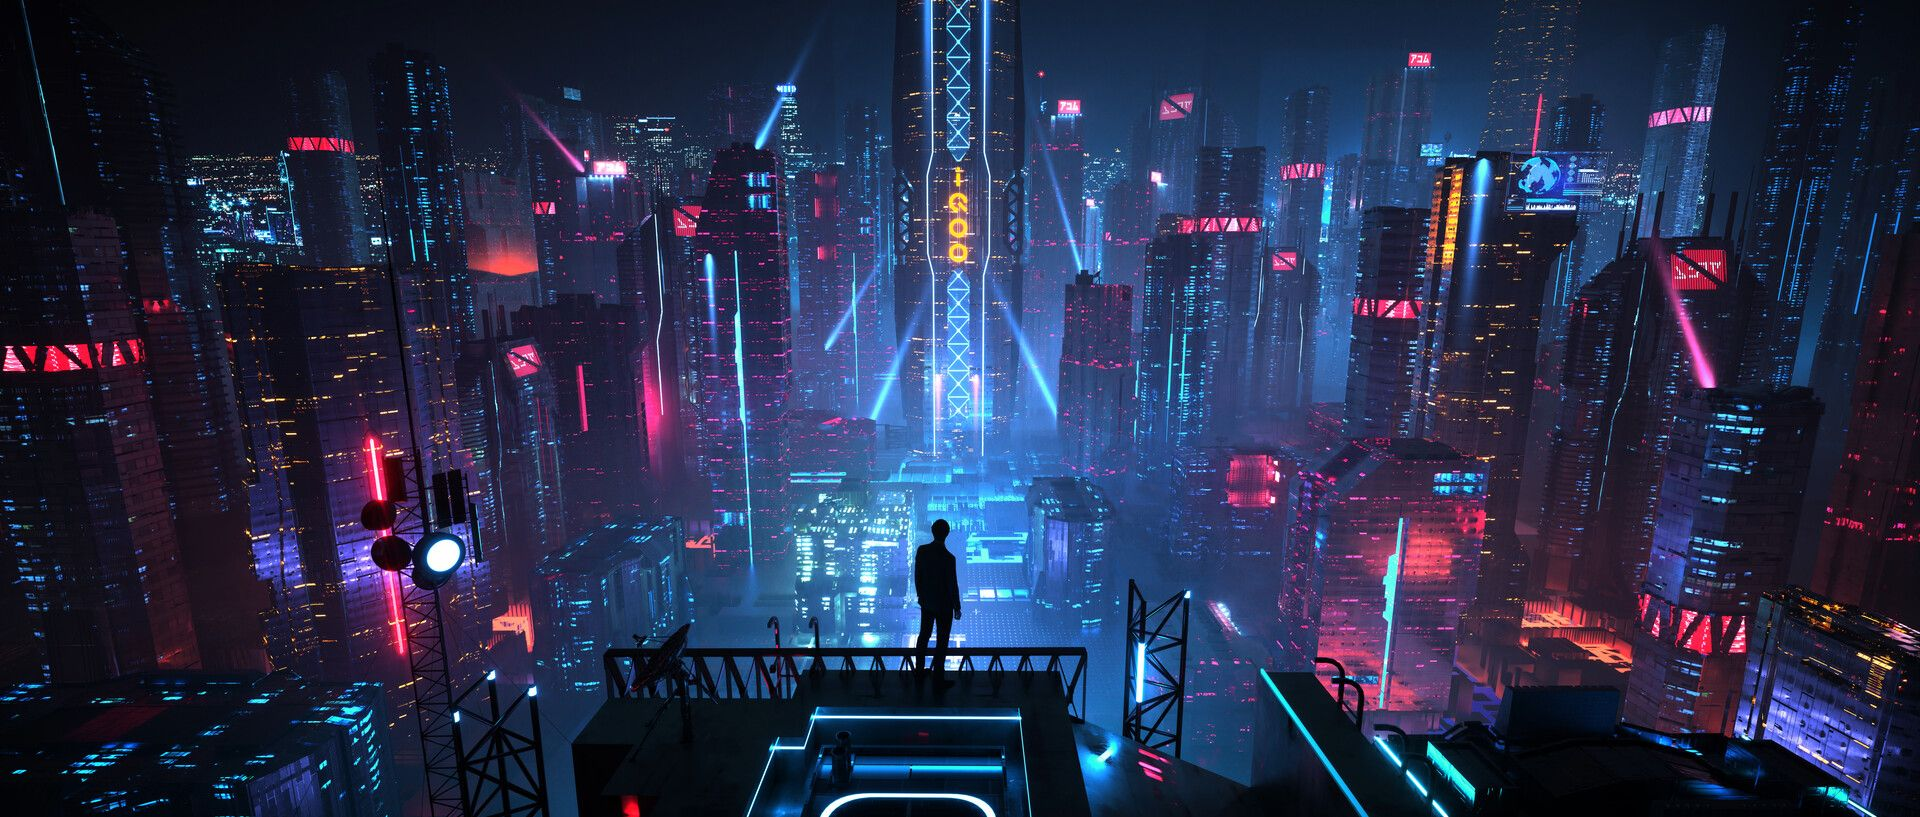 Artstation Iqoo Style Frame And Scene Design Xuteng Pan Cyberpunk City City Wallpaper Futuristic City